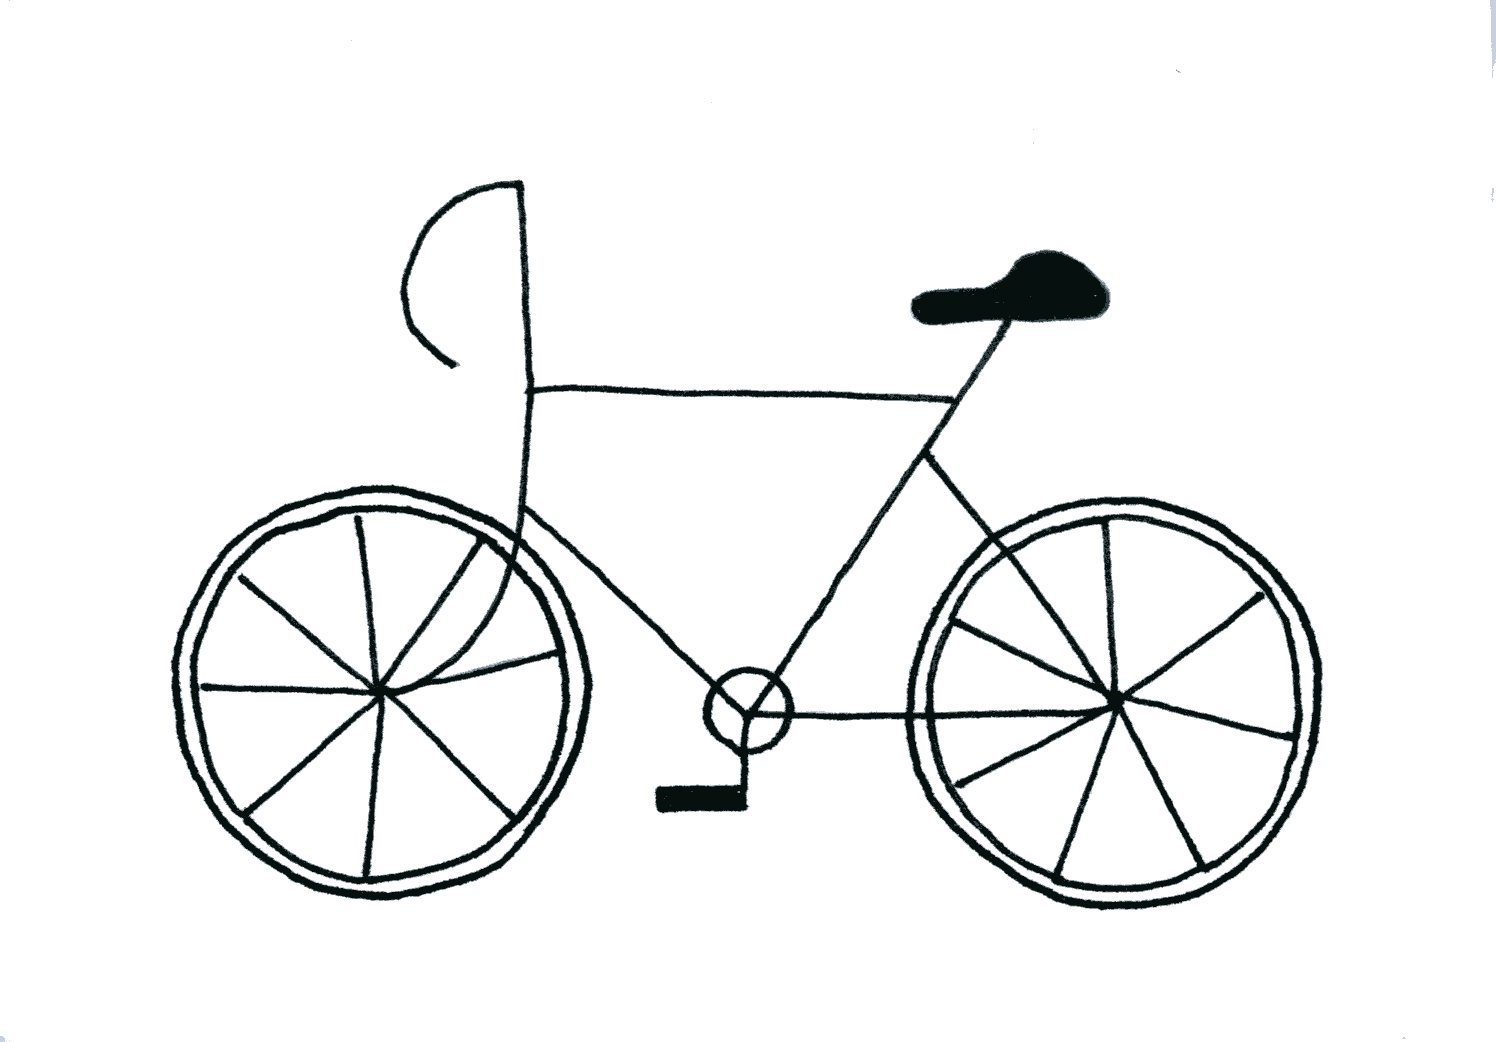 Drawn bike Bike Scooter the bicycle Moon